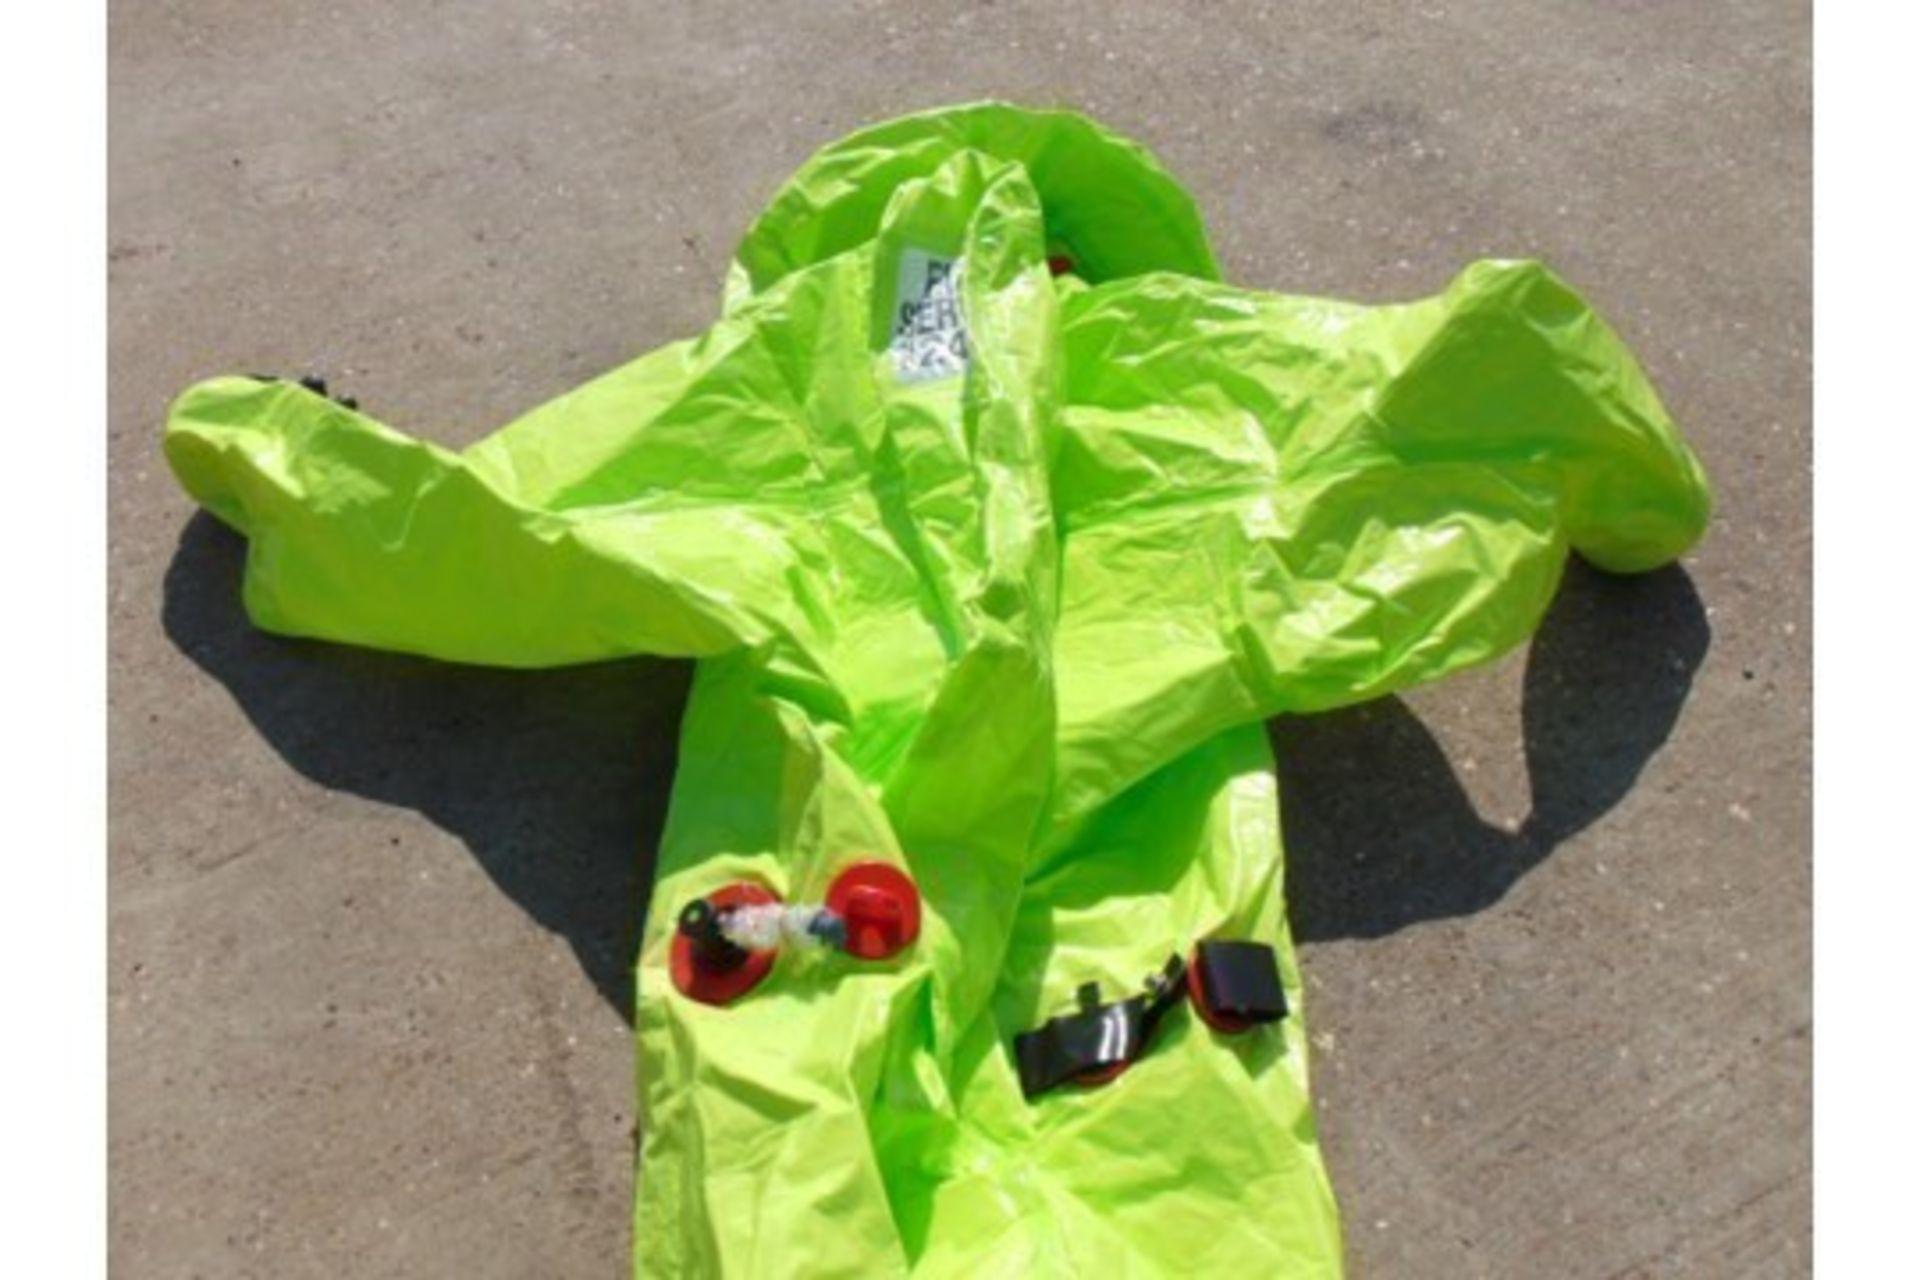 Lot 26627 - Q10 x Unissued Respirex Tychem TK Gas-Tight Hazmat Suit. Size Medium